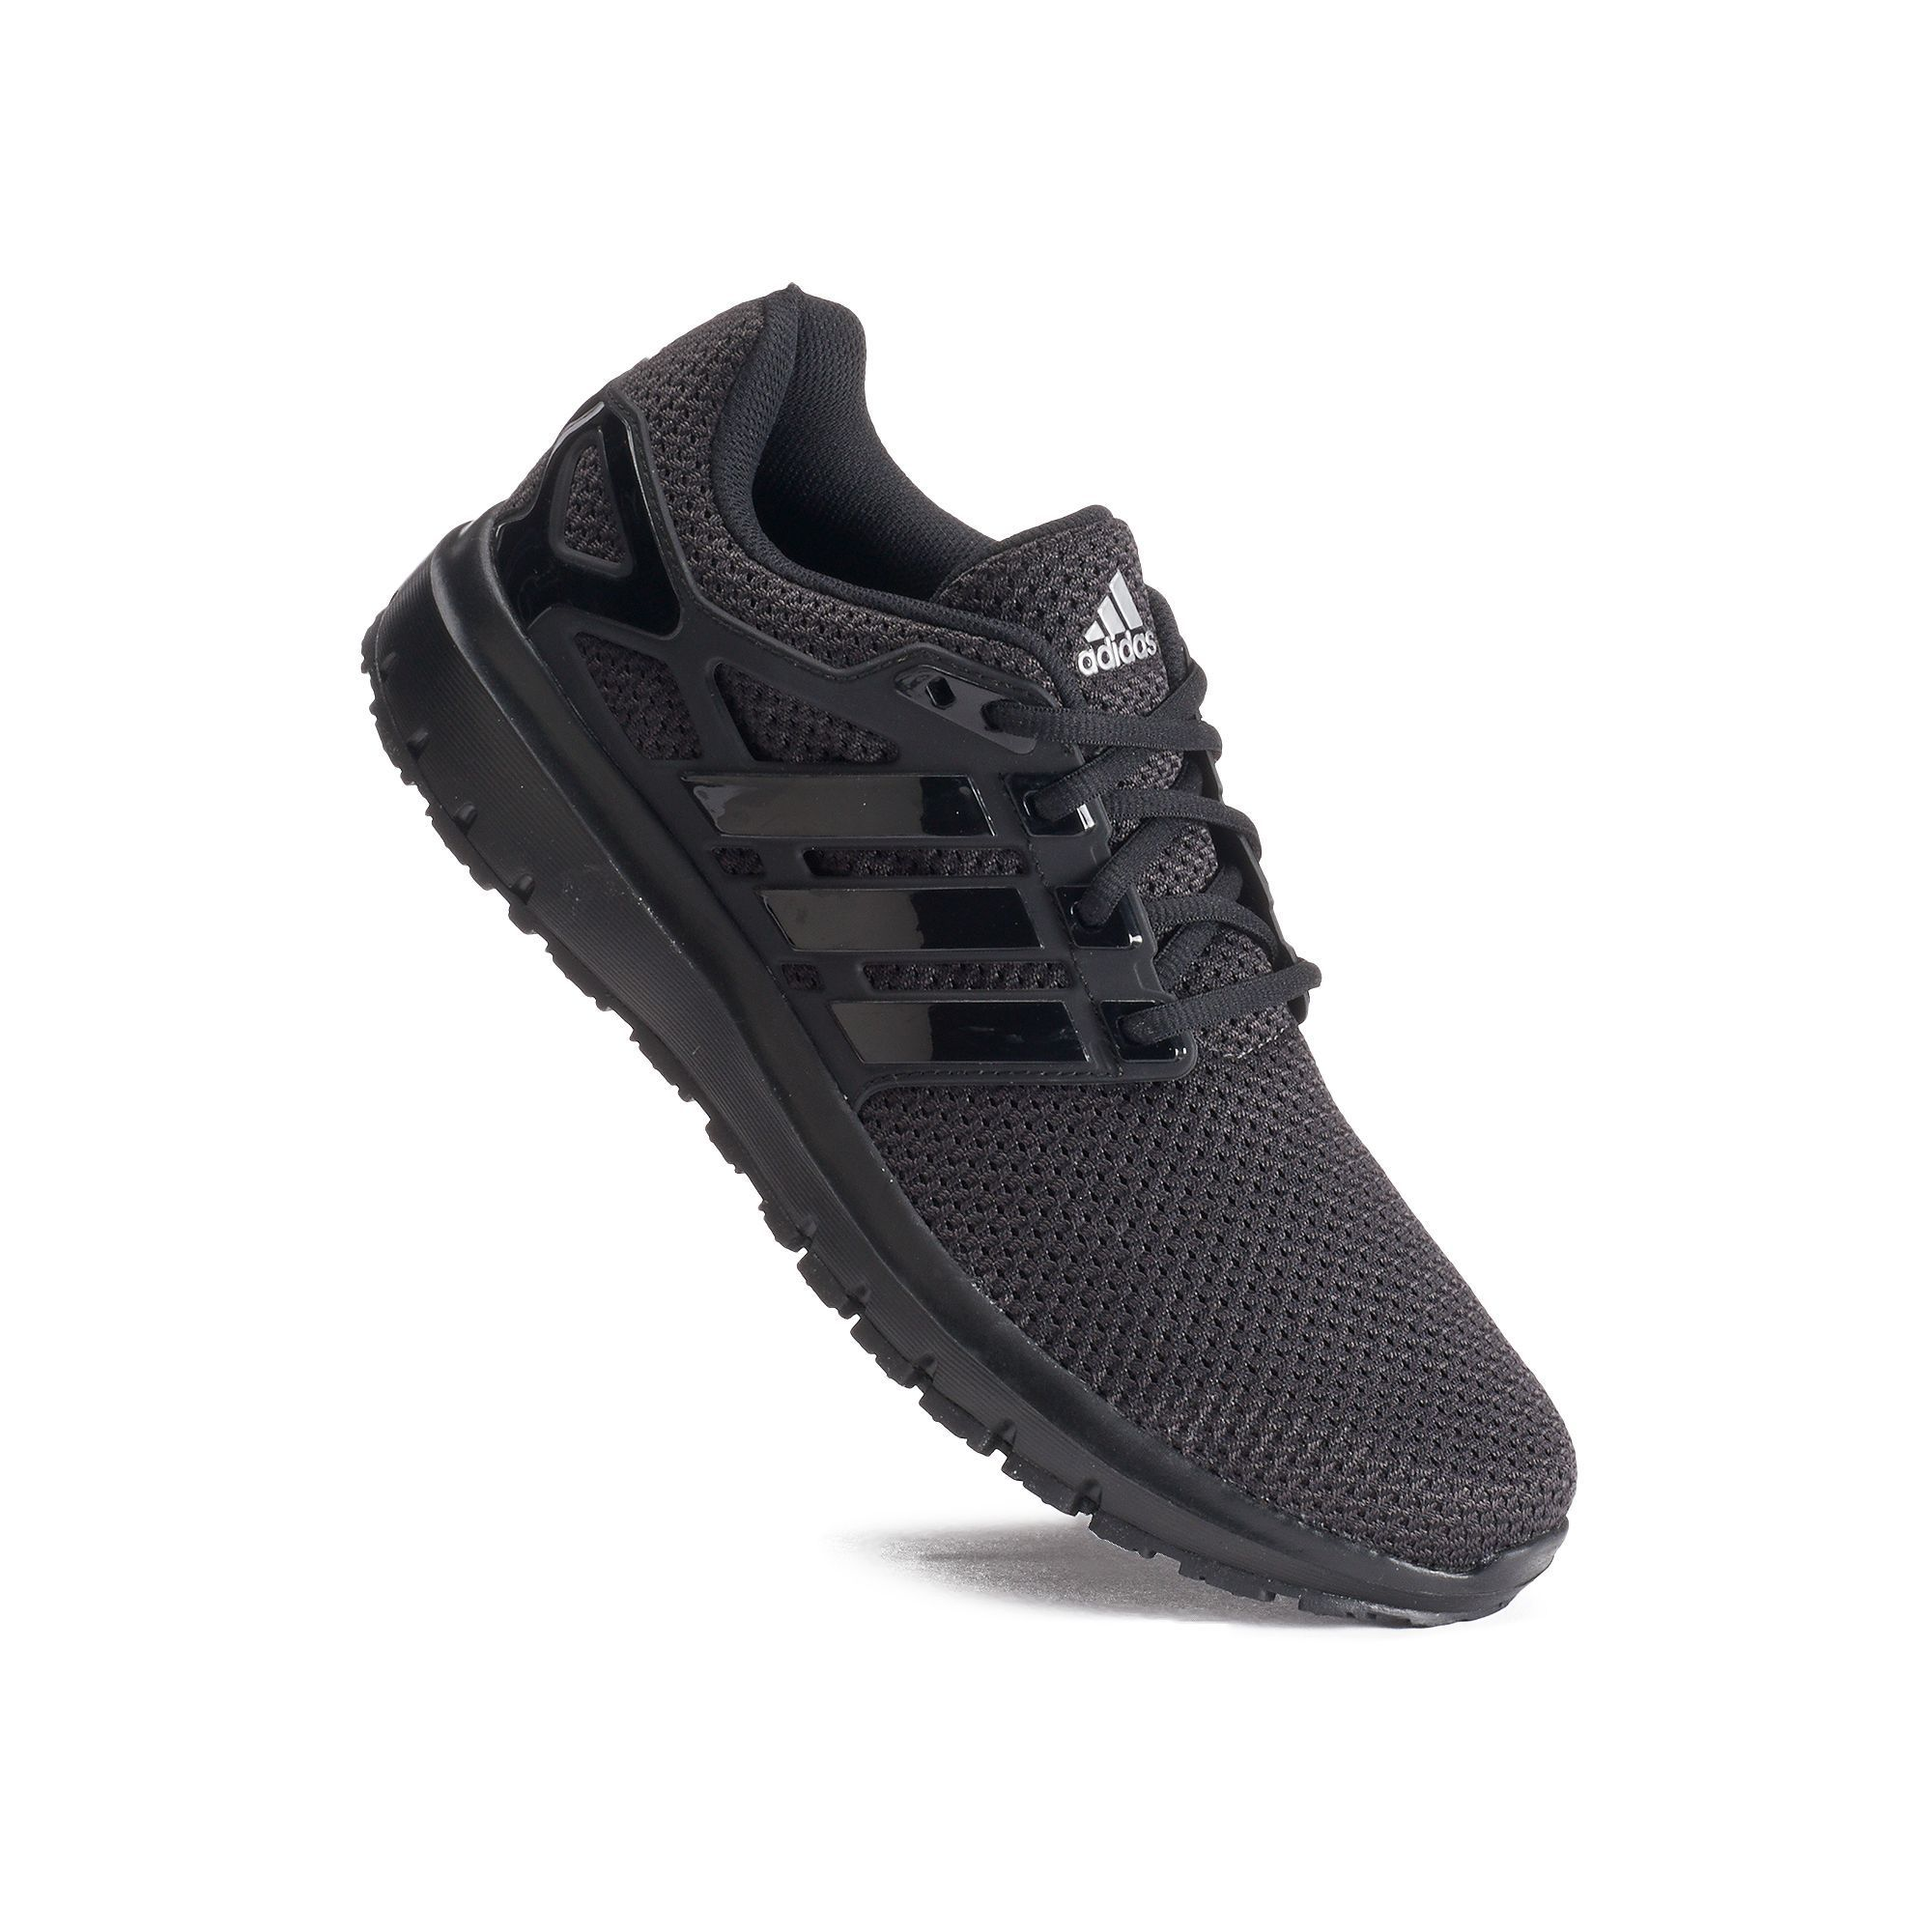 super popular 44e27 422cf Adidas Energy Cloud Mens Running Shoes, Size 10.5 Wide, Black